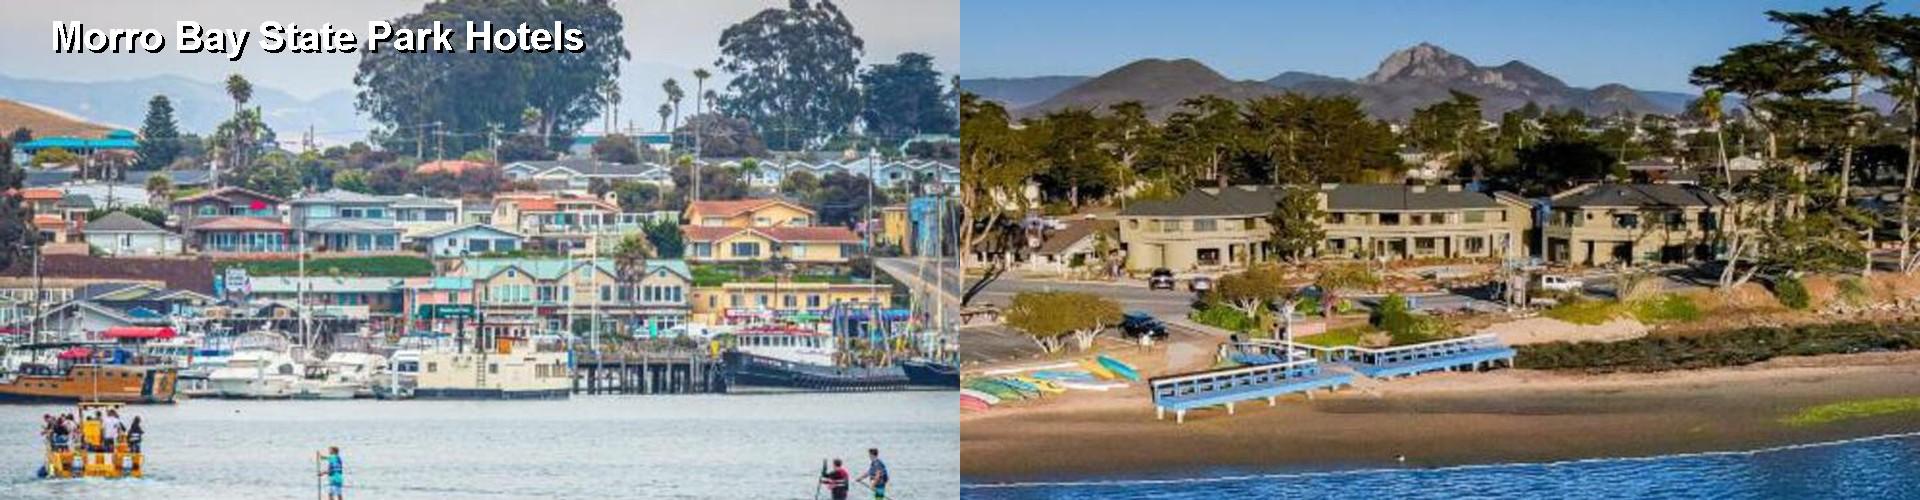 5 Best Hotels Near Morro Bay State Park